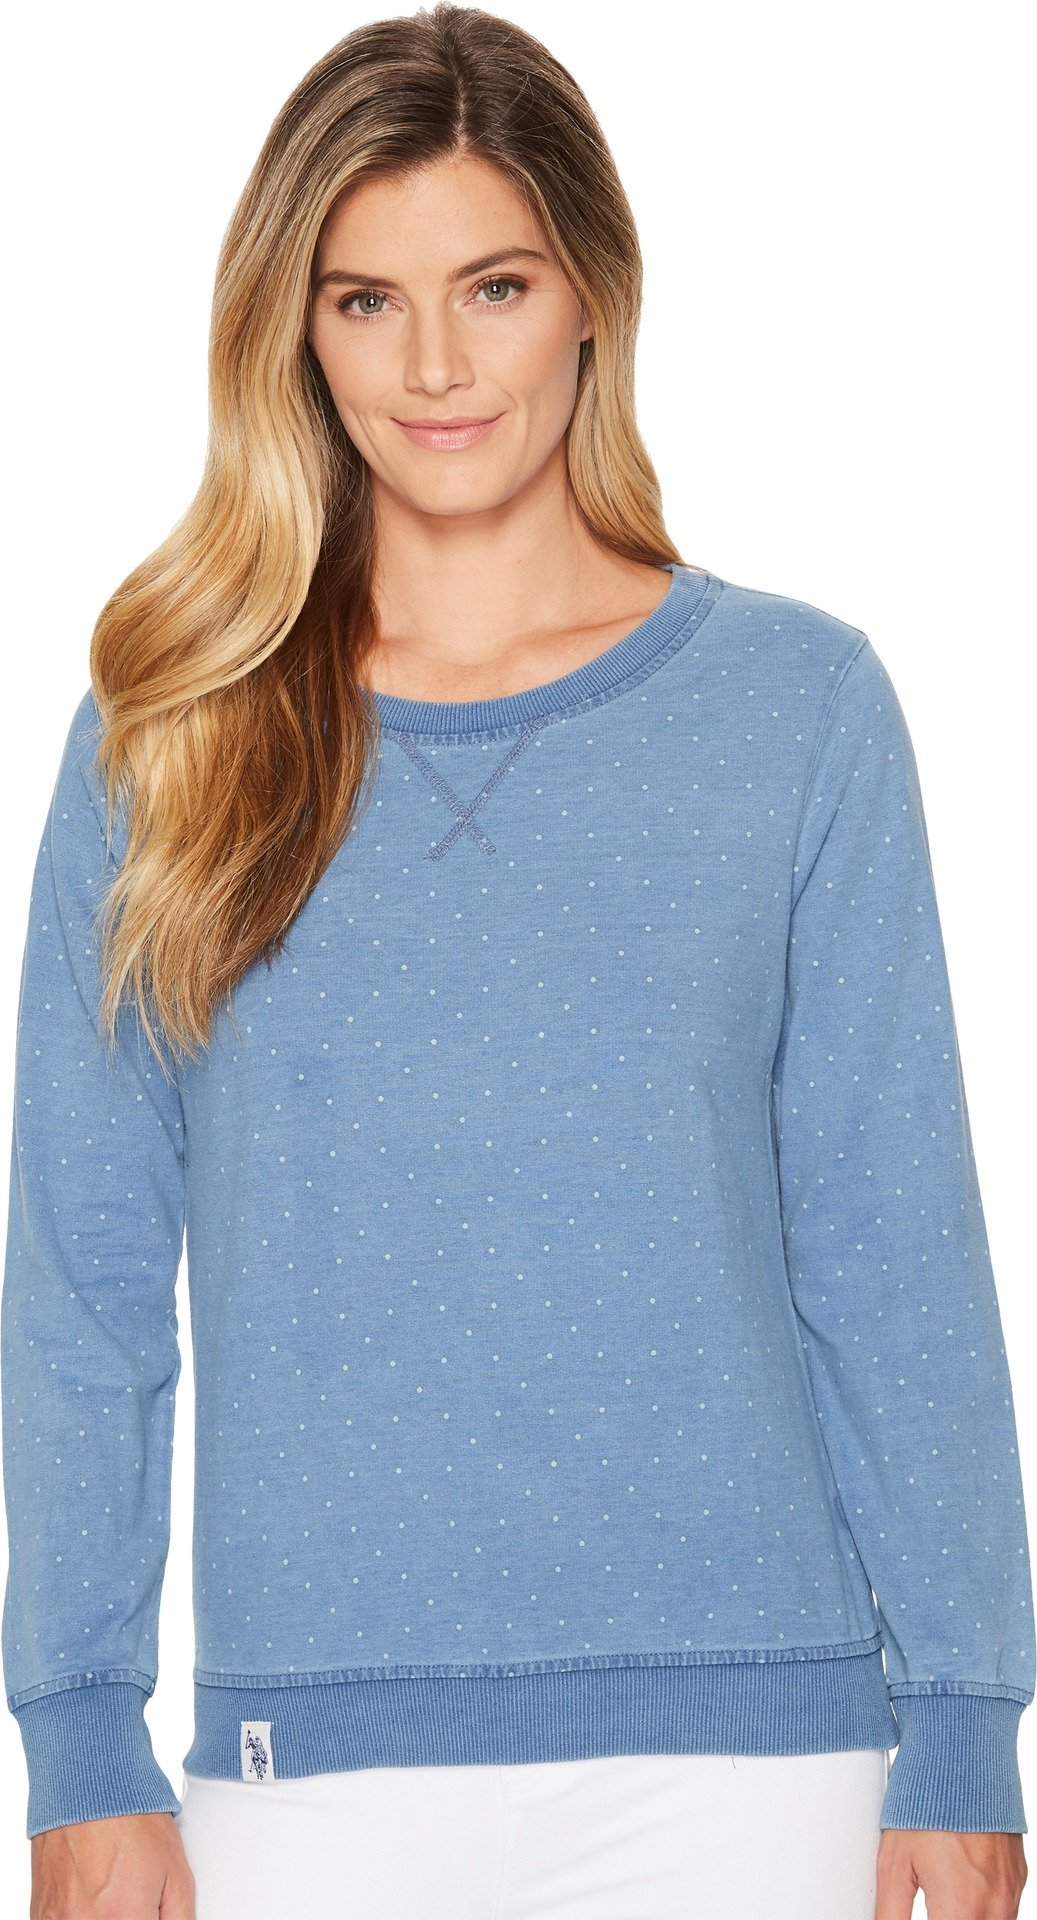 U.S. Polo Assn. Women's Knitted Sweatshirt Blue X-Large